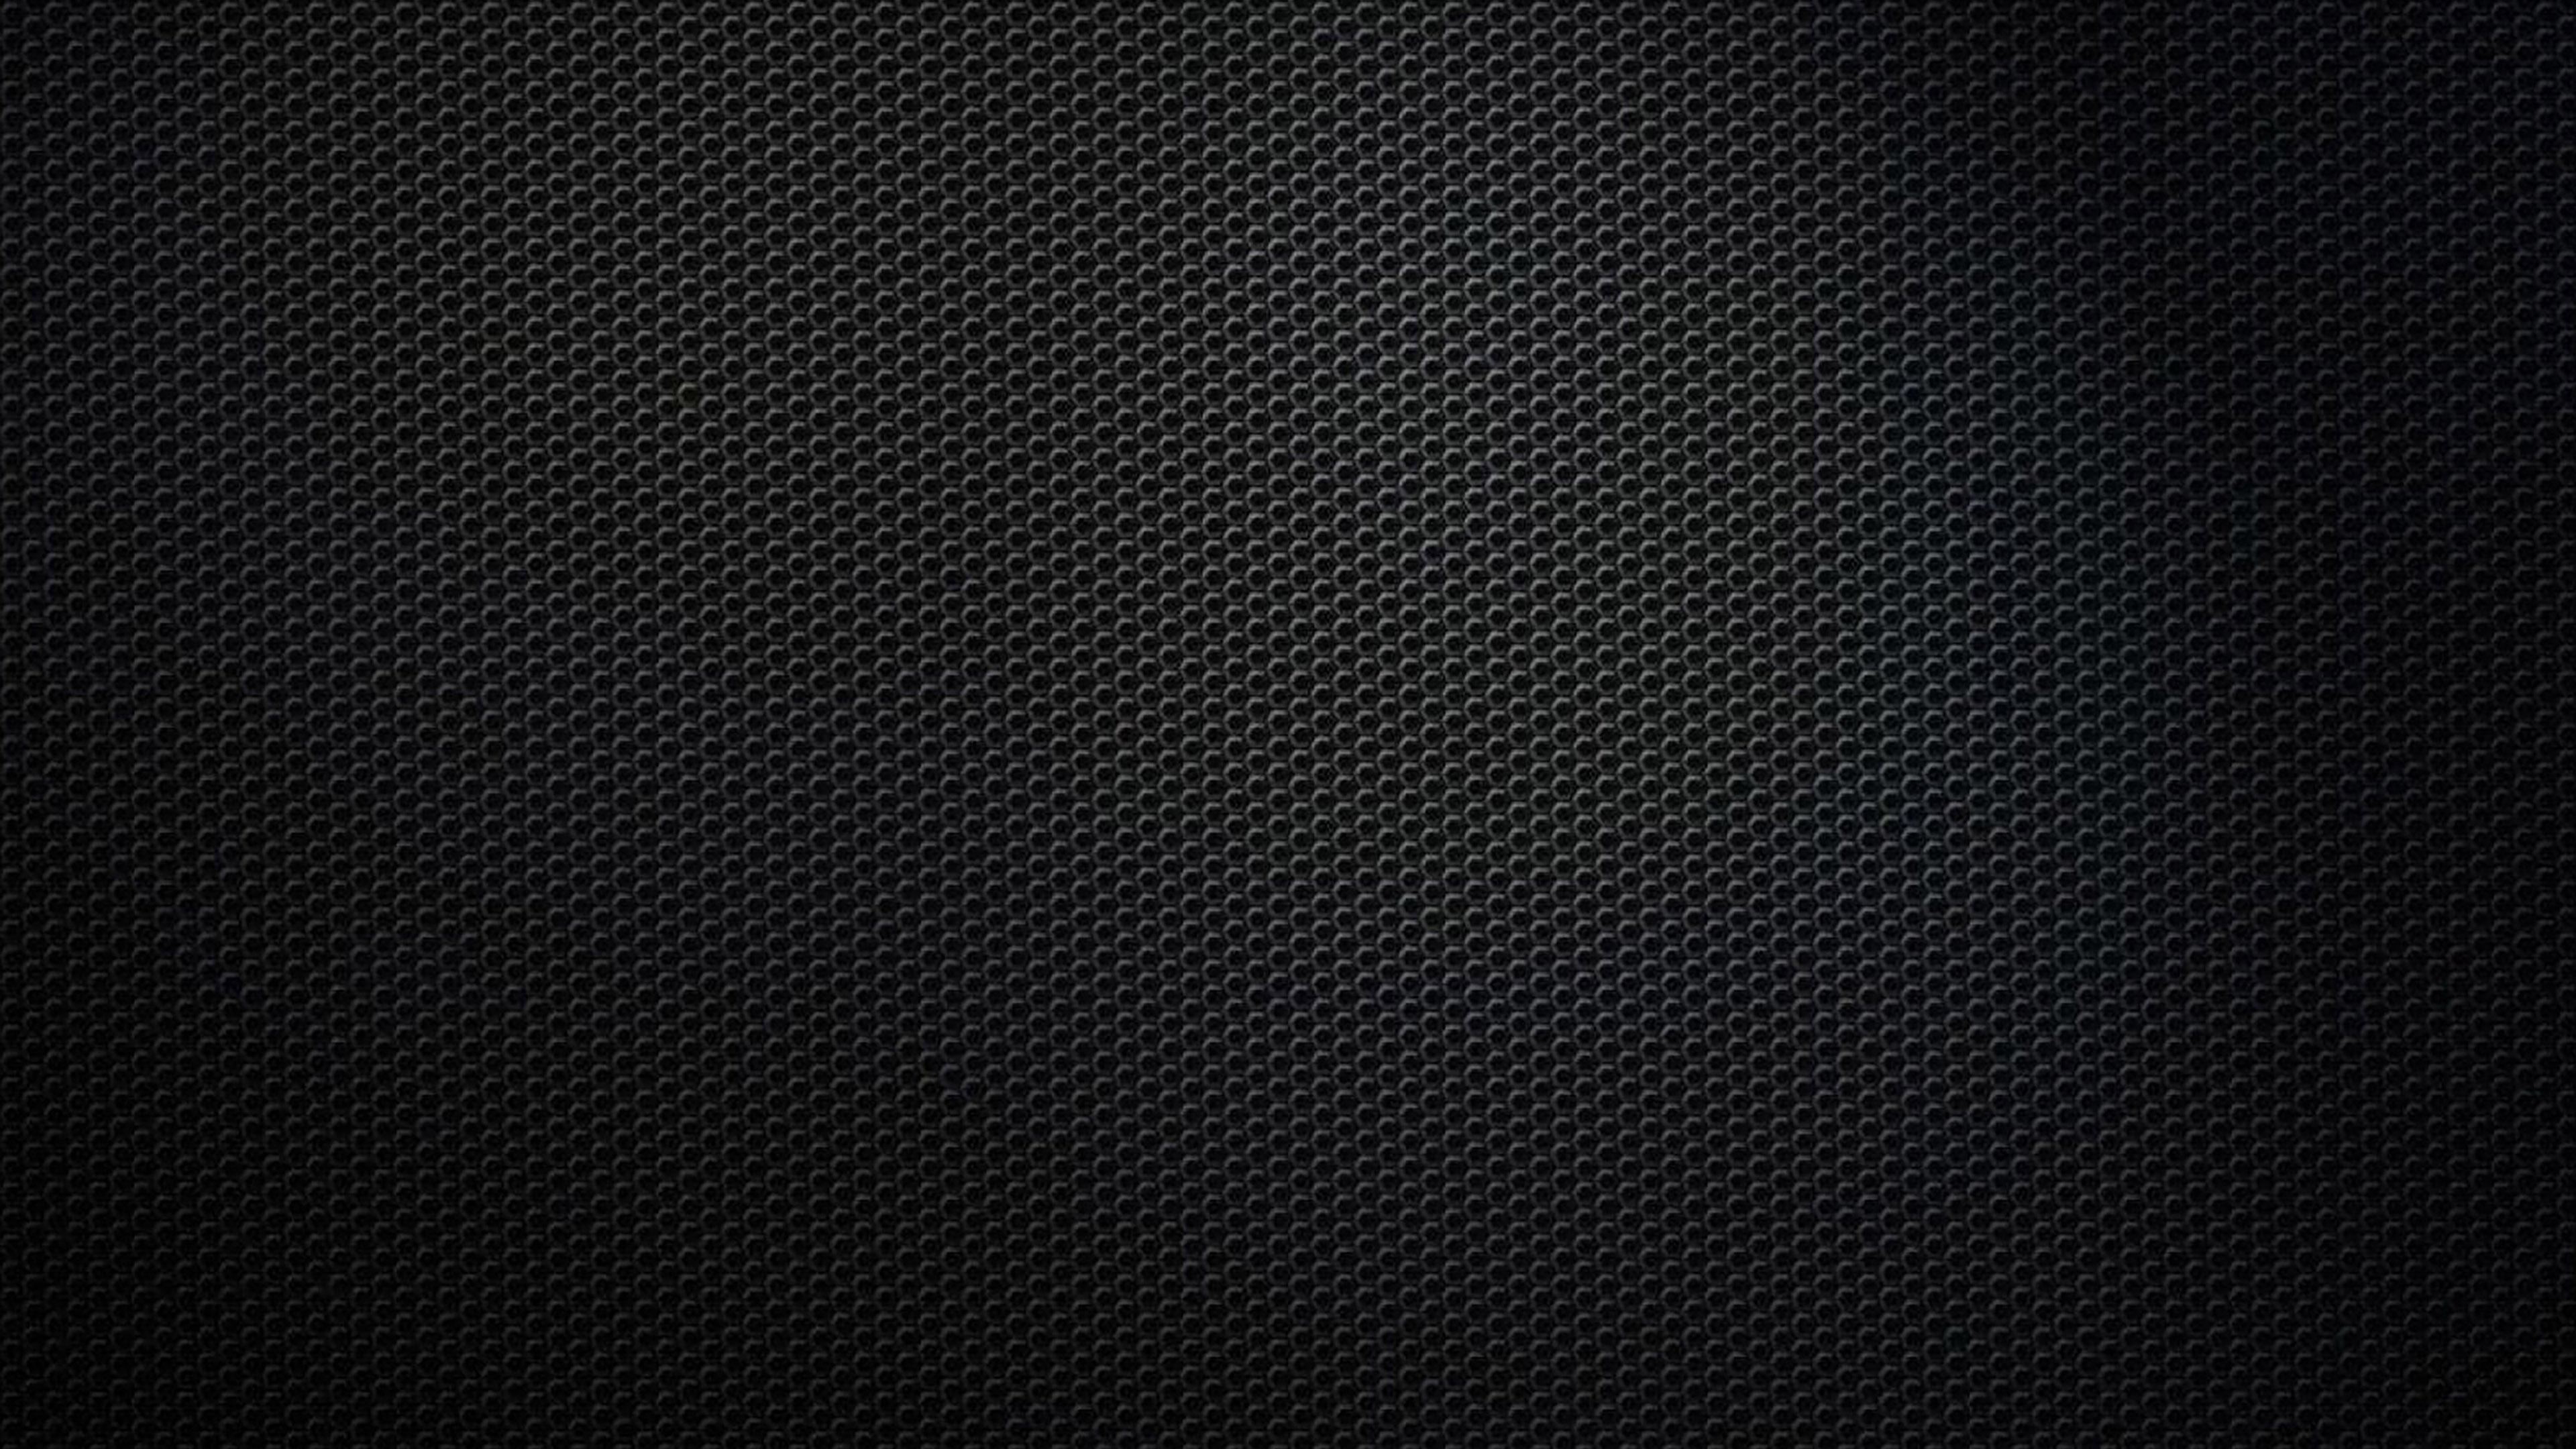 Carbon Wallpaper Iphone X Va43 Carbon Pattern Black Pattern Papers Co